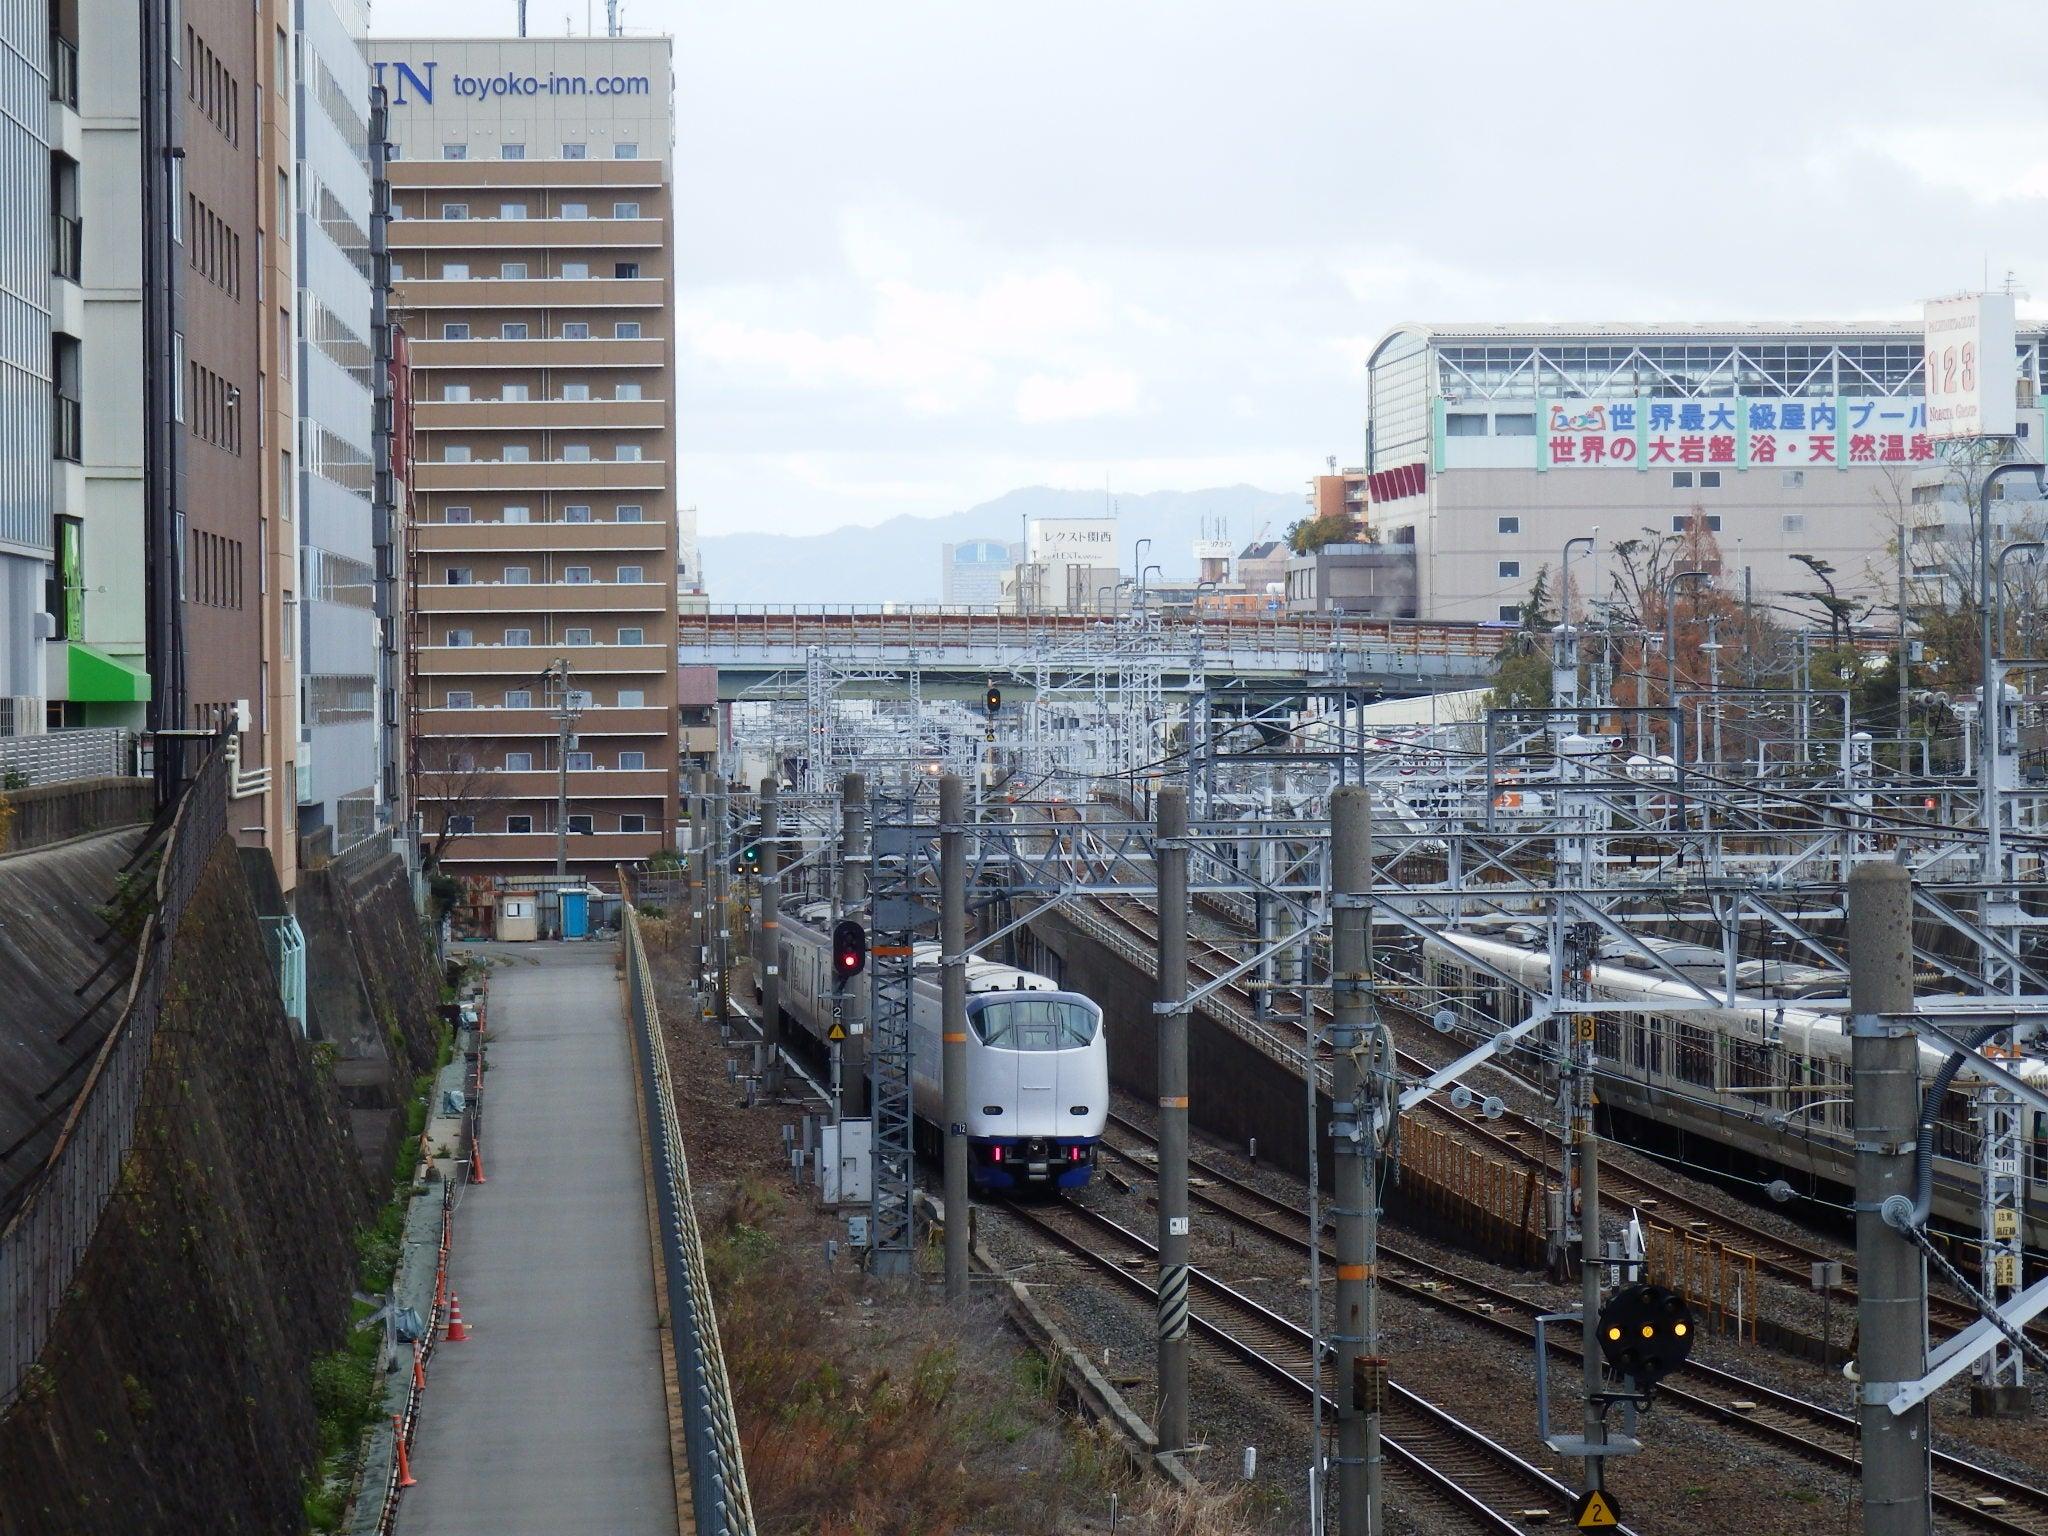 Kz-Square【廃線跡めぐり】南海電鉄・天王寺支線